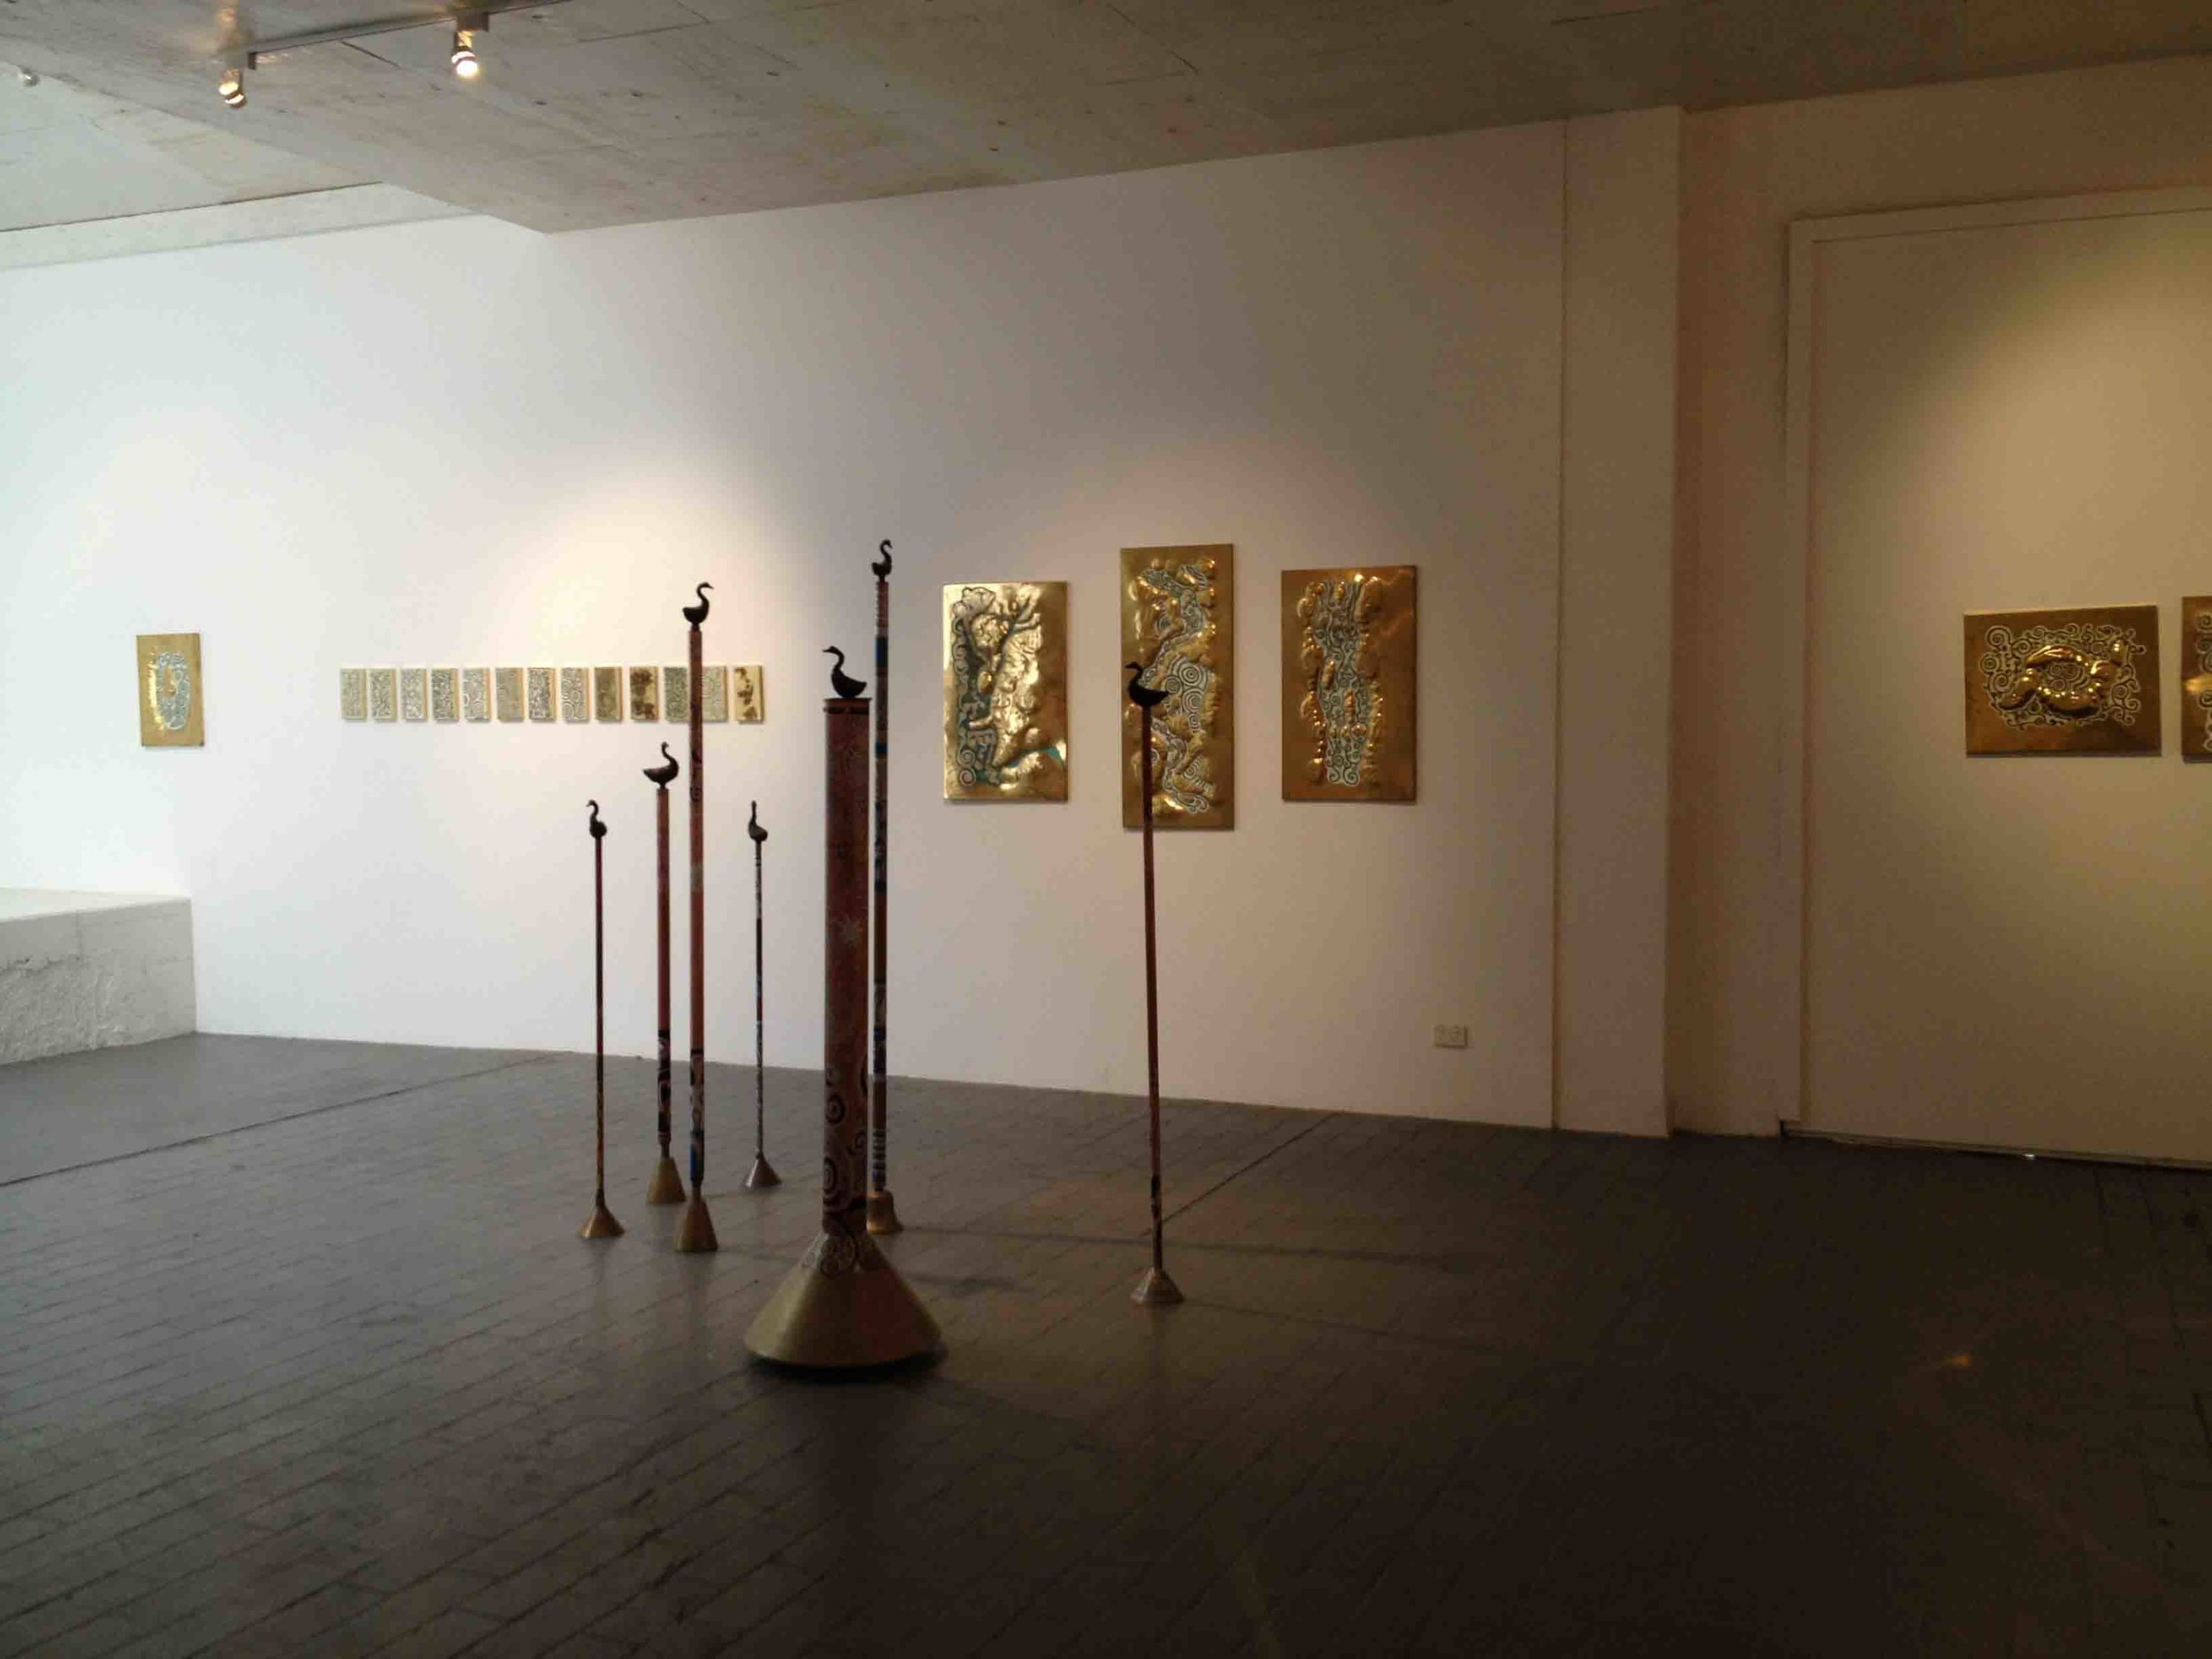 'Warrnambool'  Stockroom Gallery Kyneton 2013